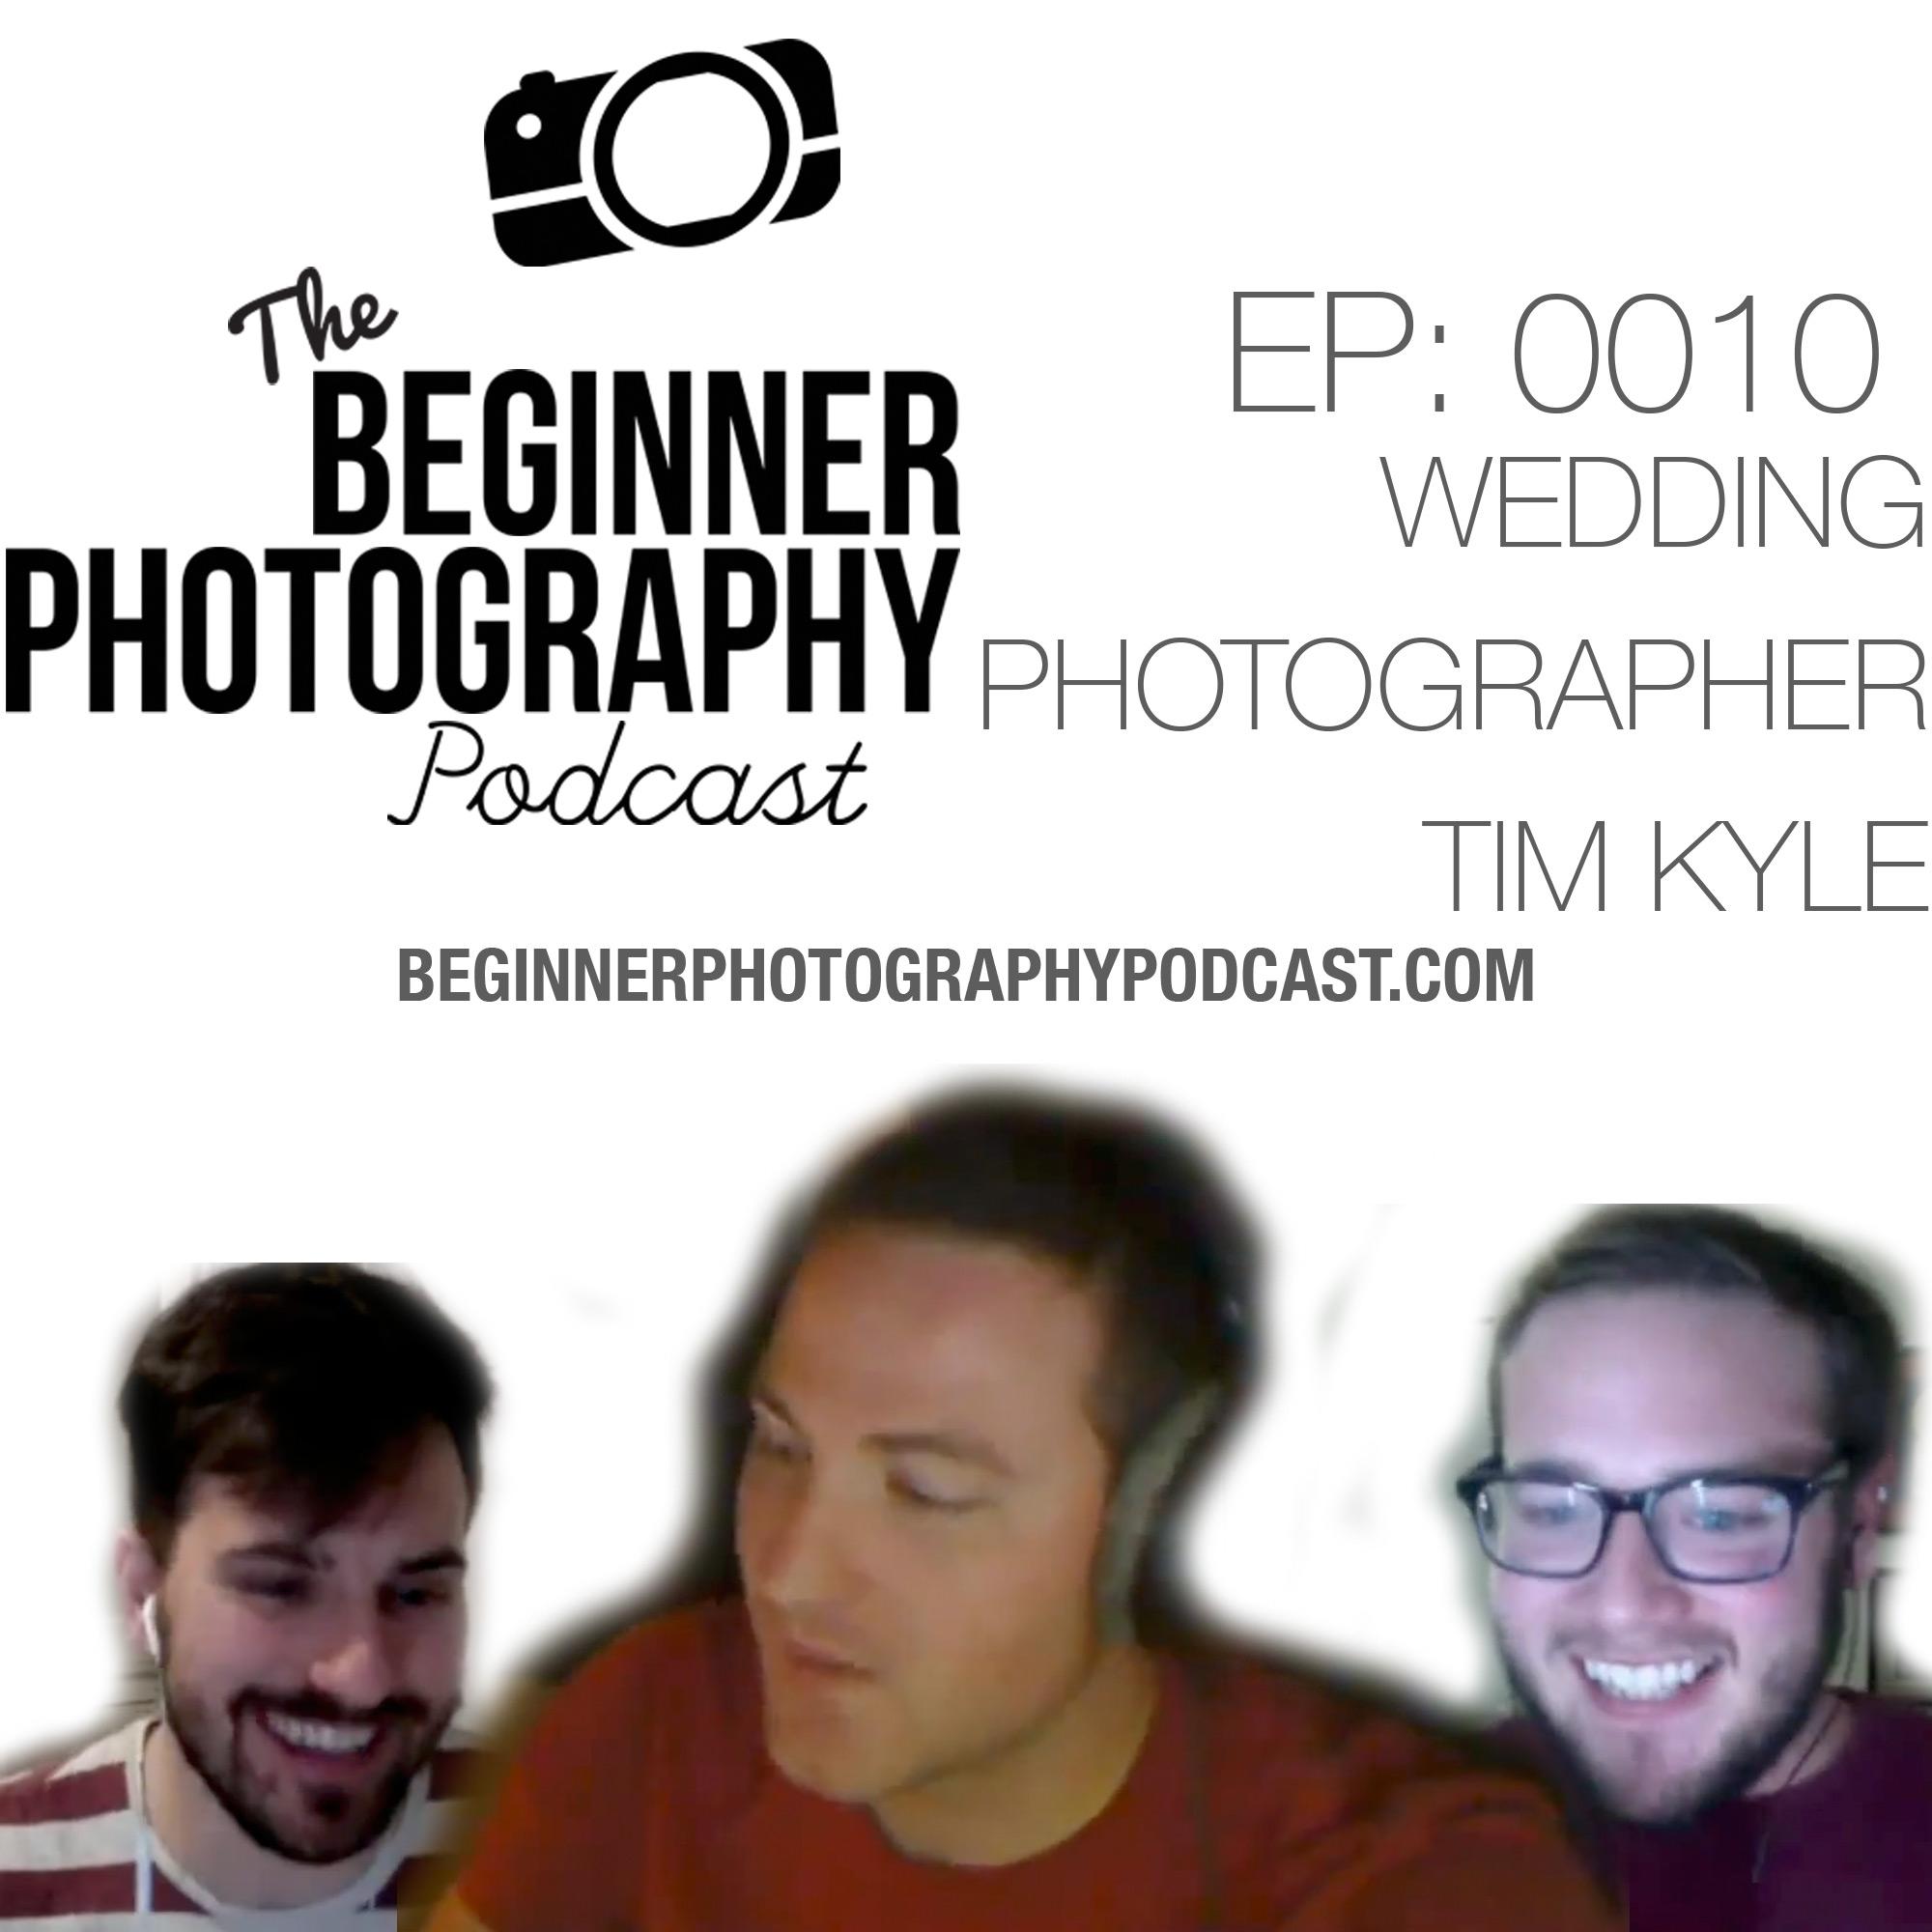 Austin-Wedding-Photographer-Podcast